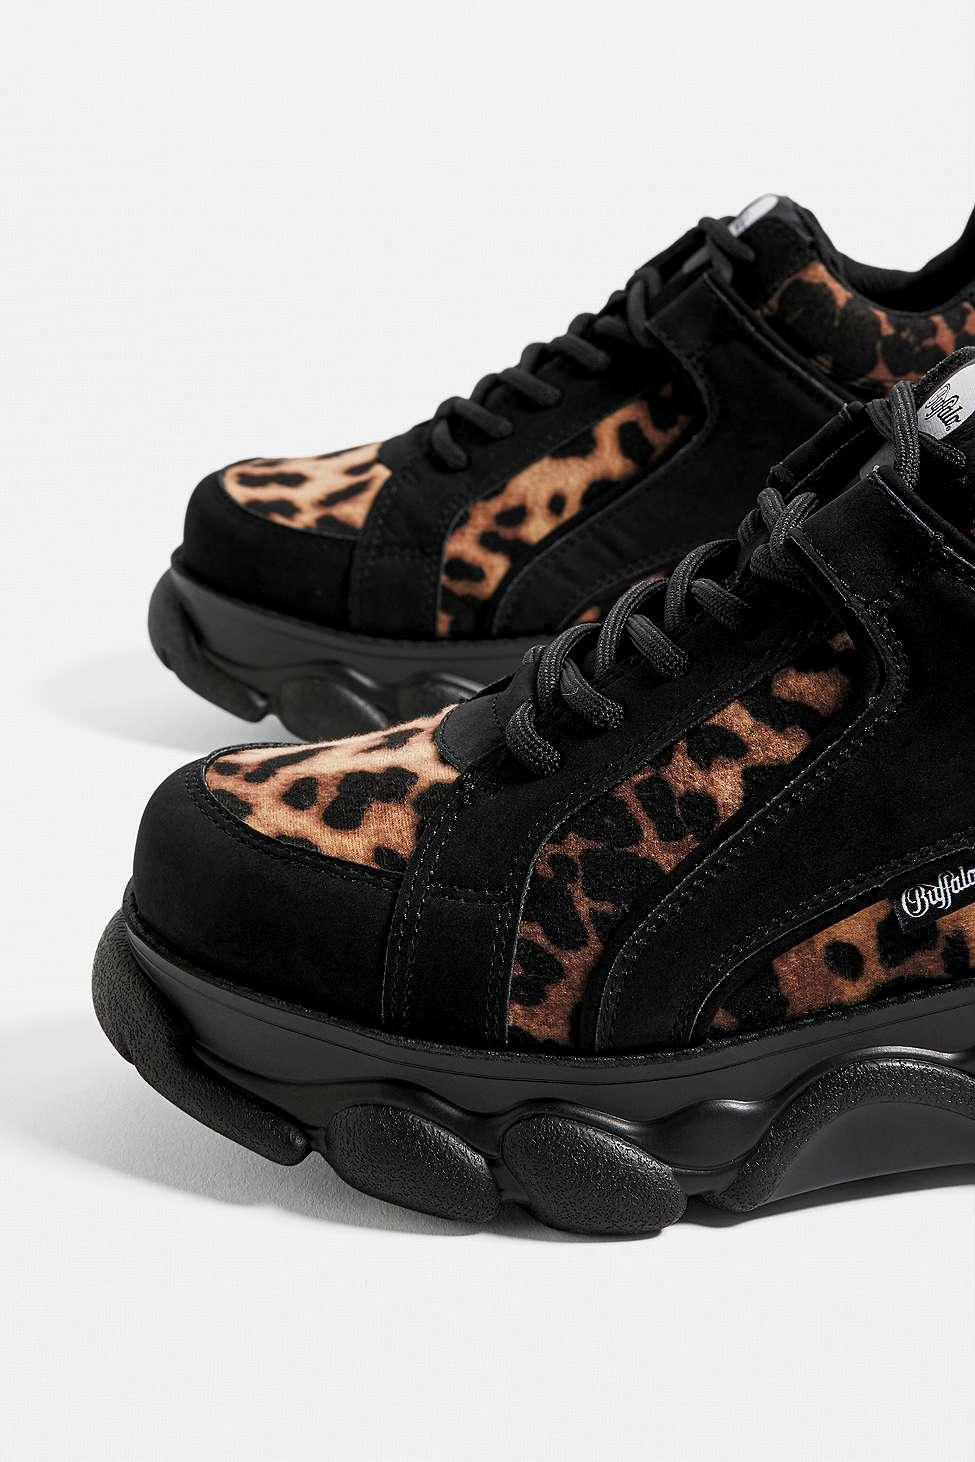 Buffalo Corin Leopard Print Trainers in